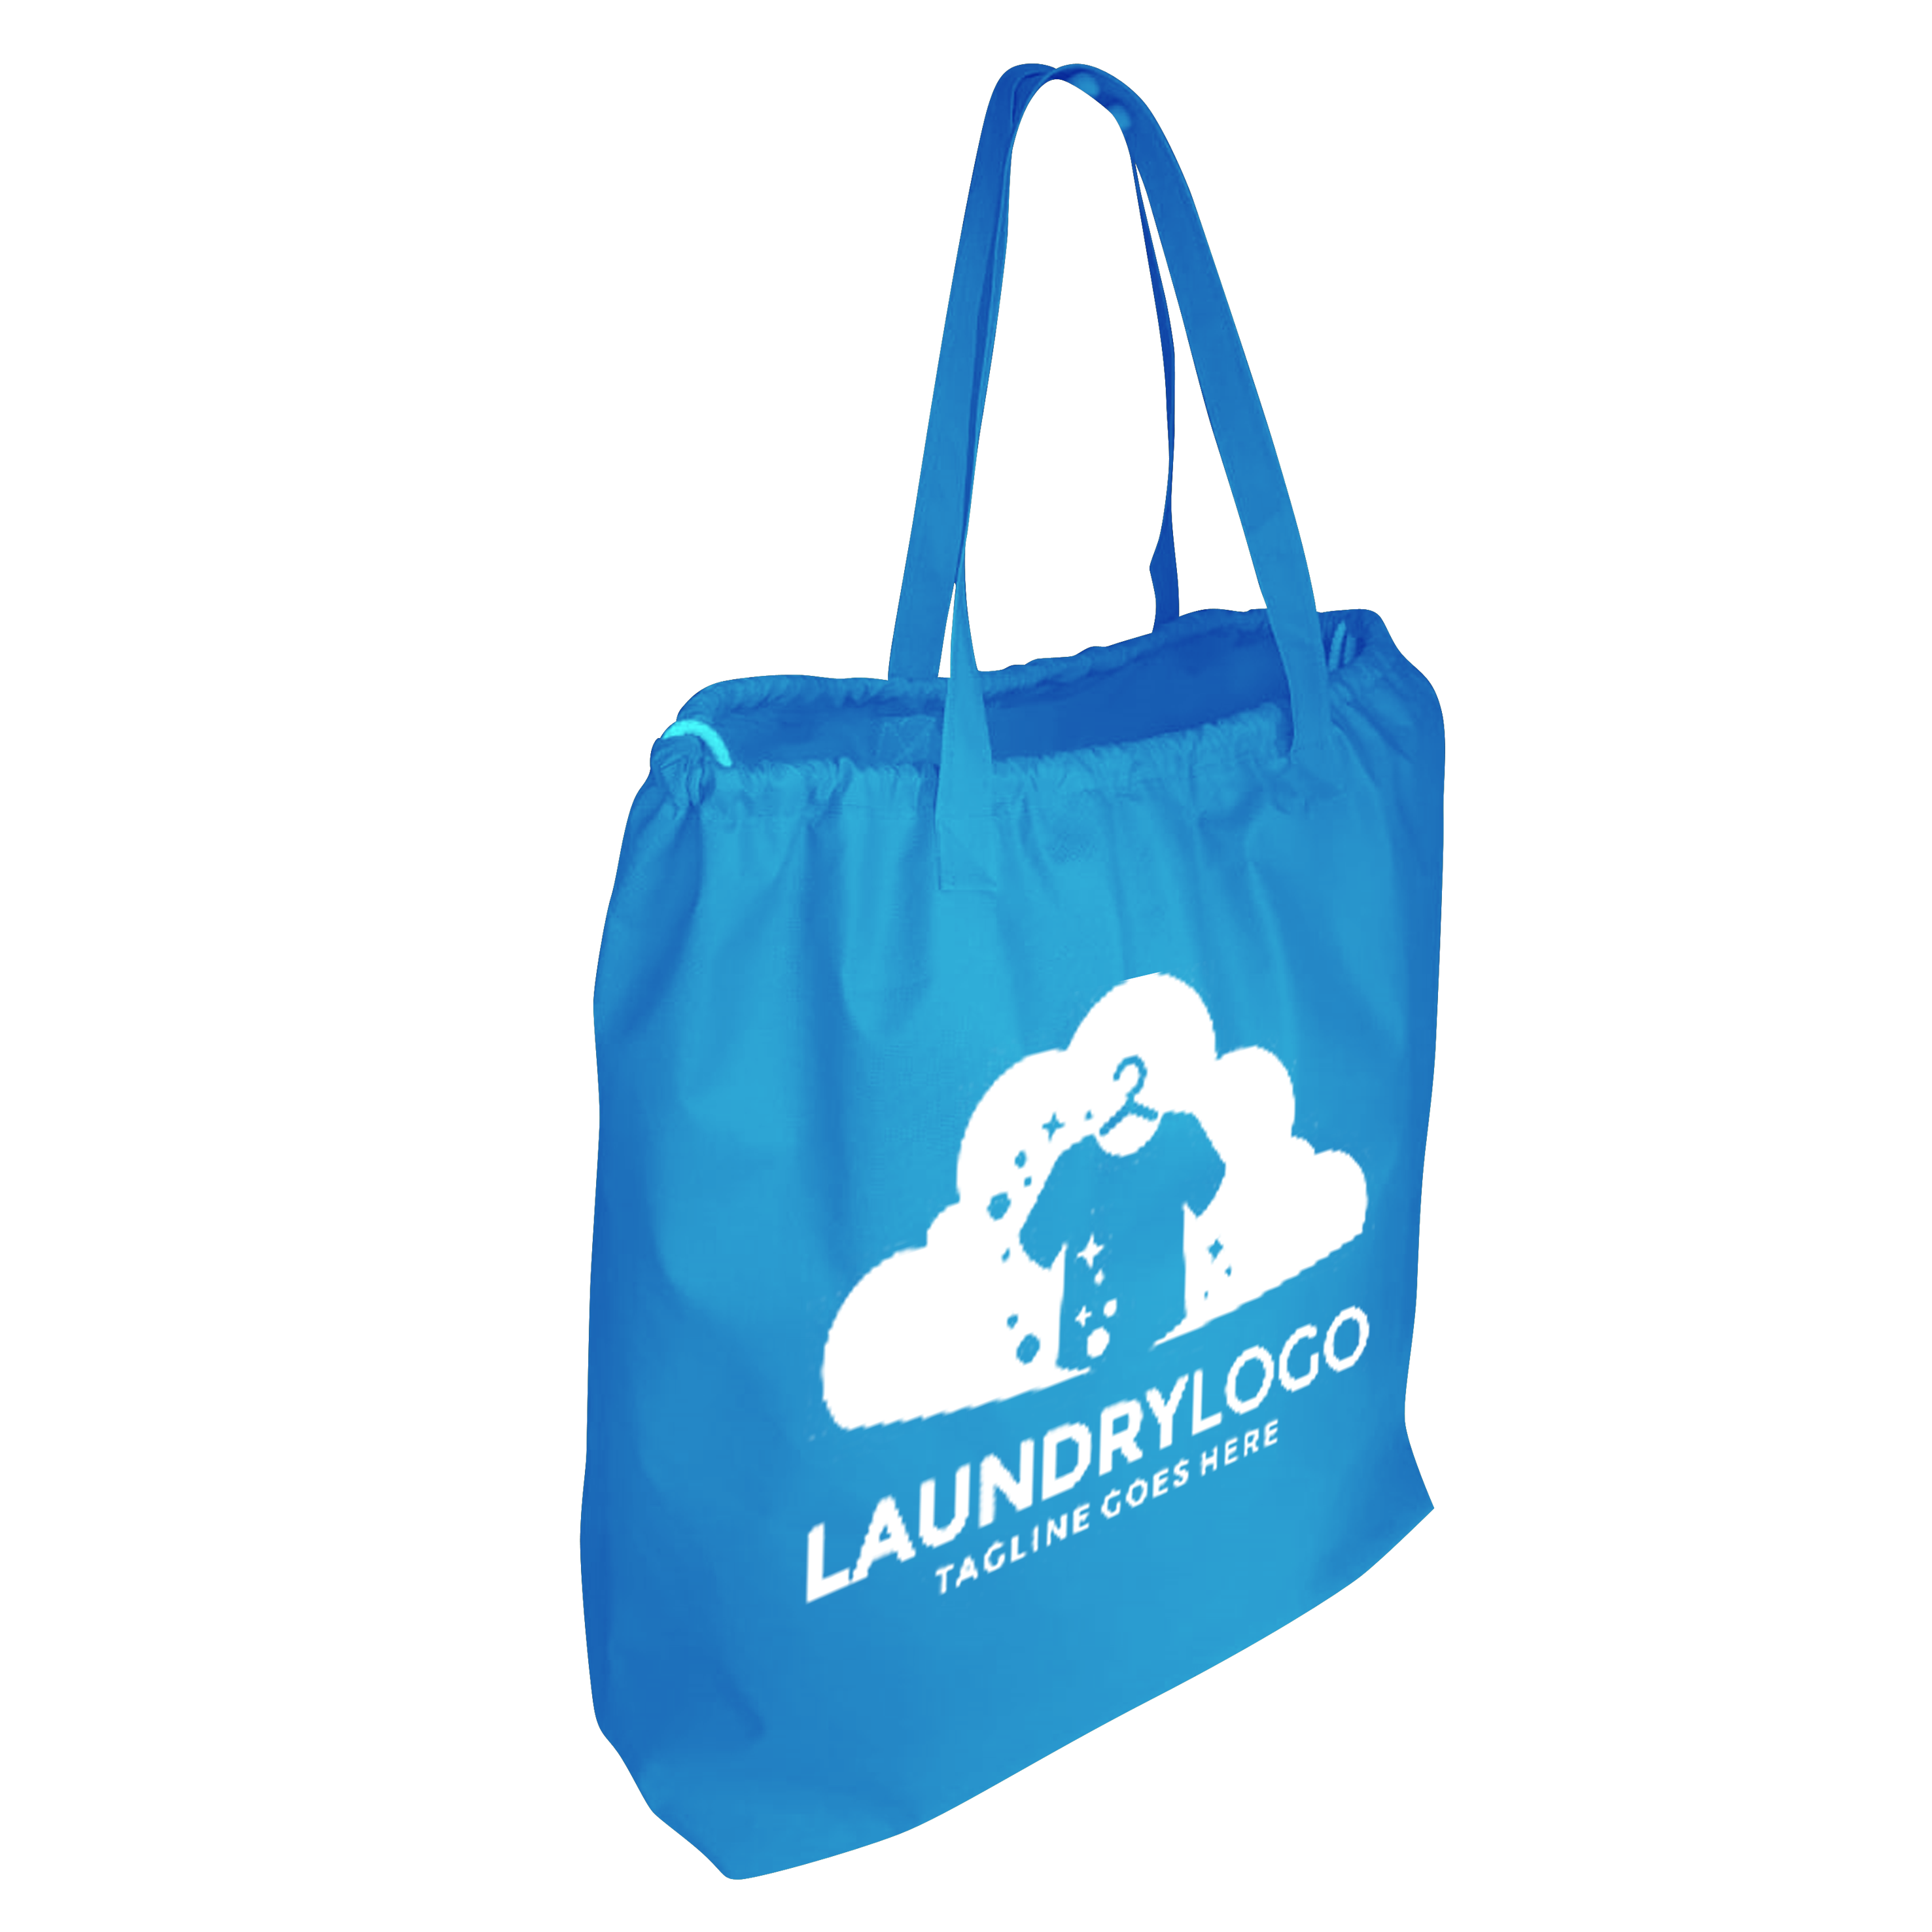 Tas Spunbond Laundry 163 tas laundry